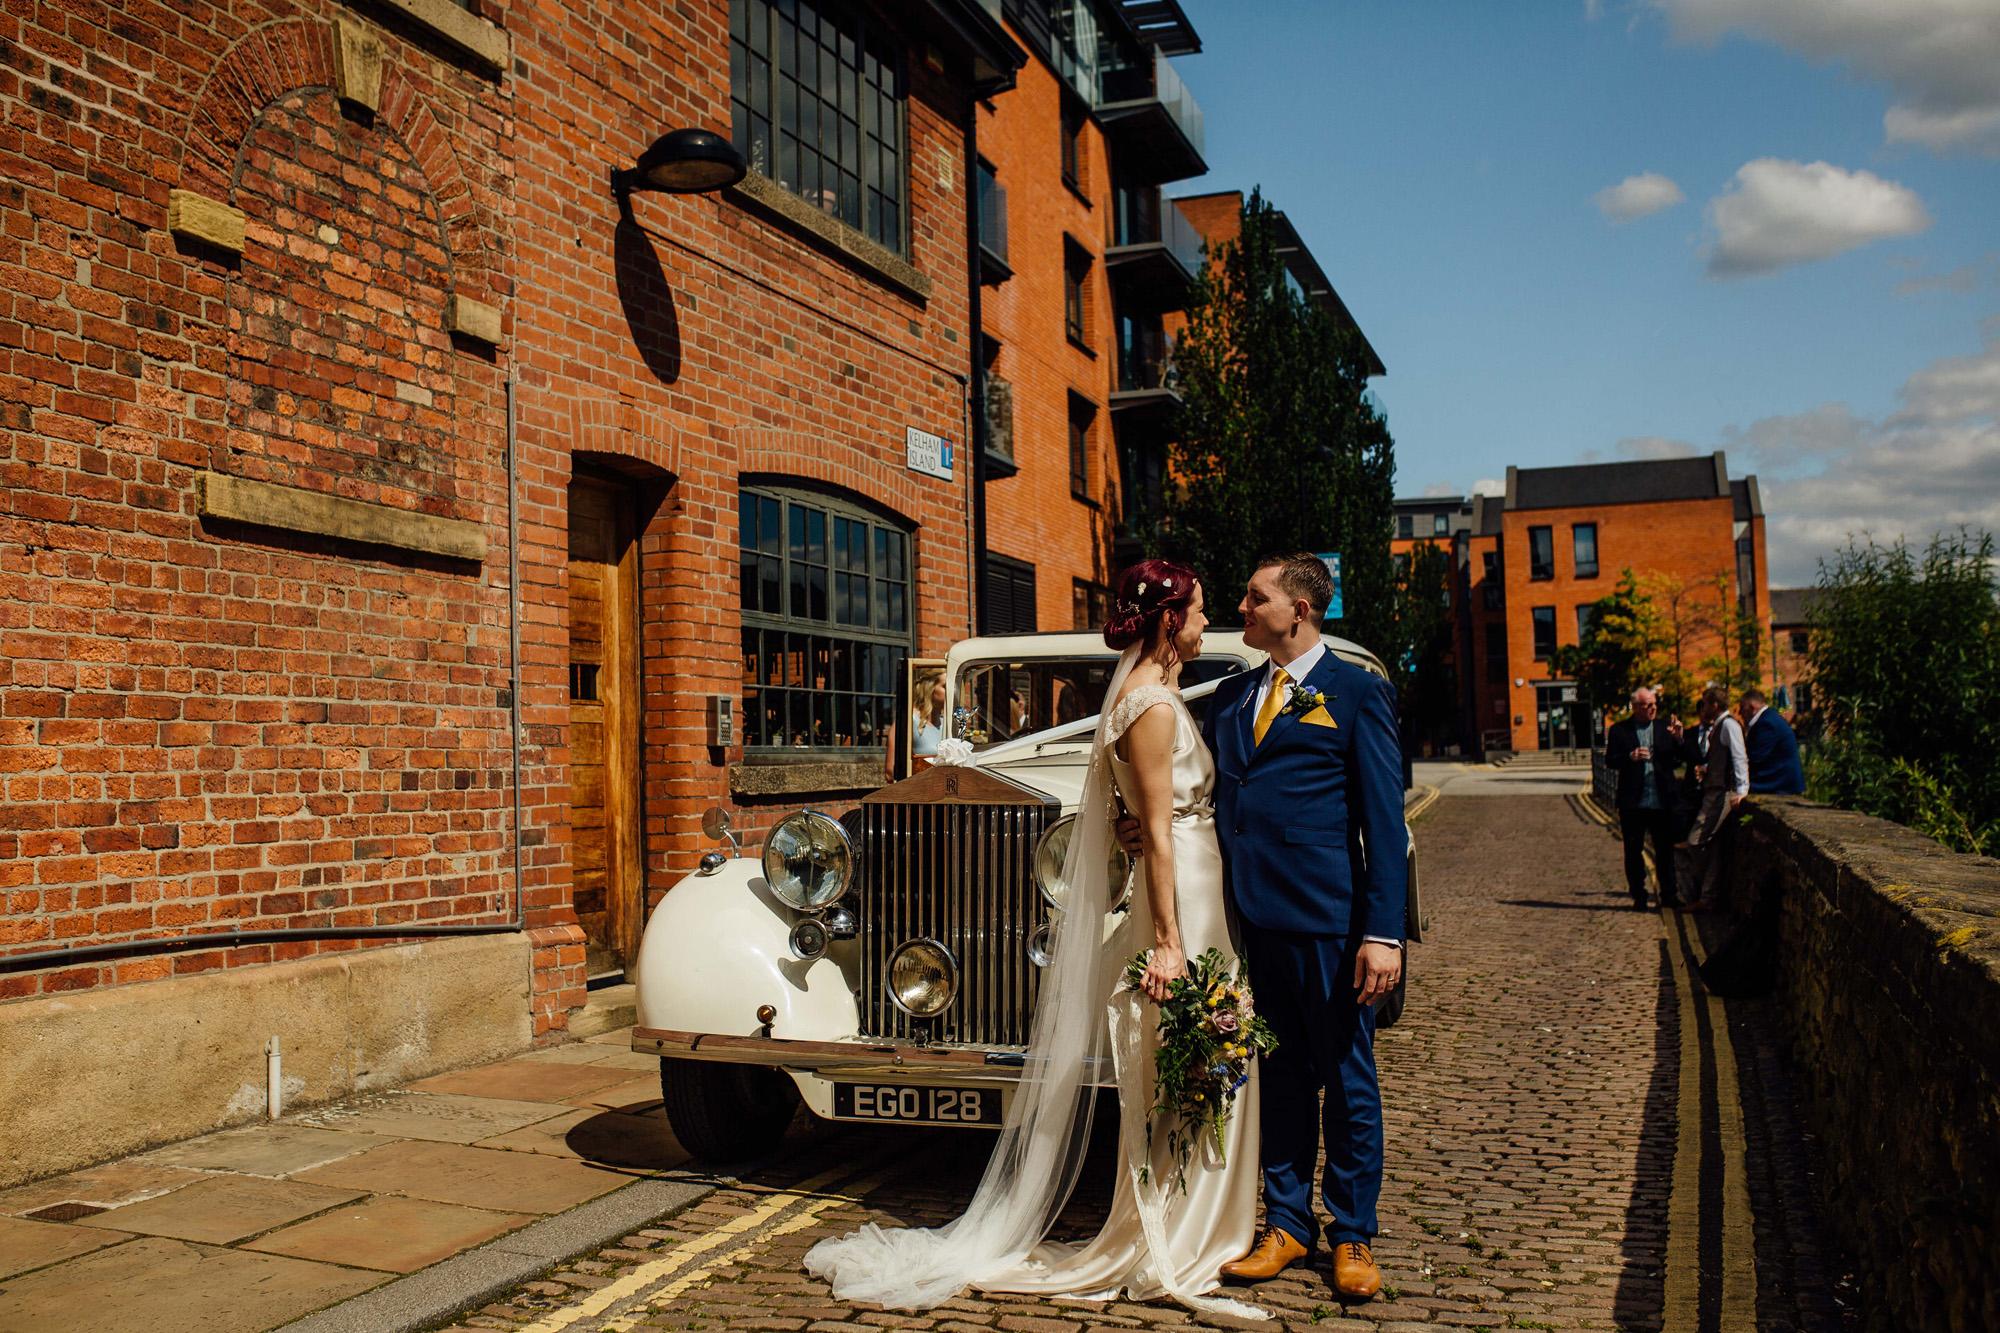 Sarah-Honeysuckle-Bias-Cut-Silk-Vintage-Inspired-Wedding-Gown-Sheffield-Wedding-Kate-Beaumont-37.jpg